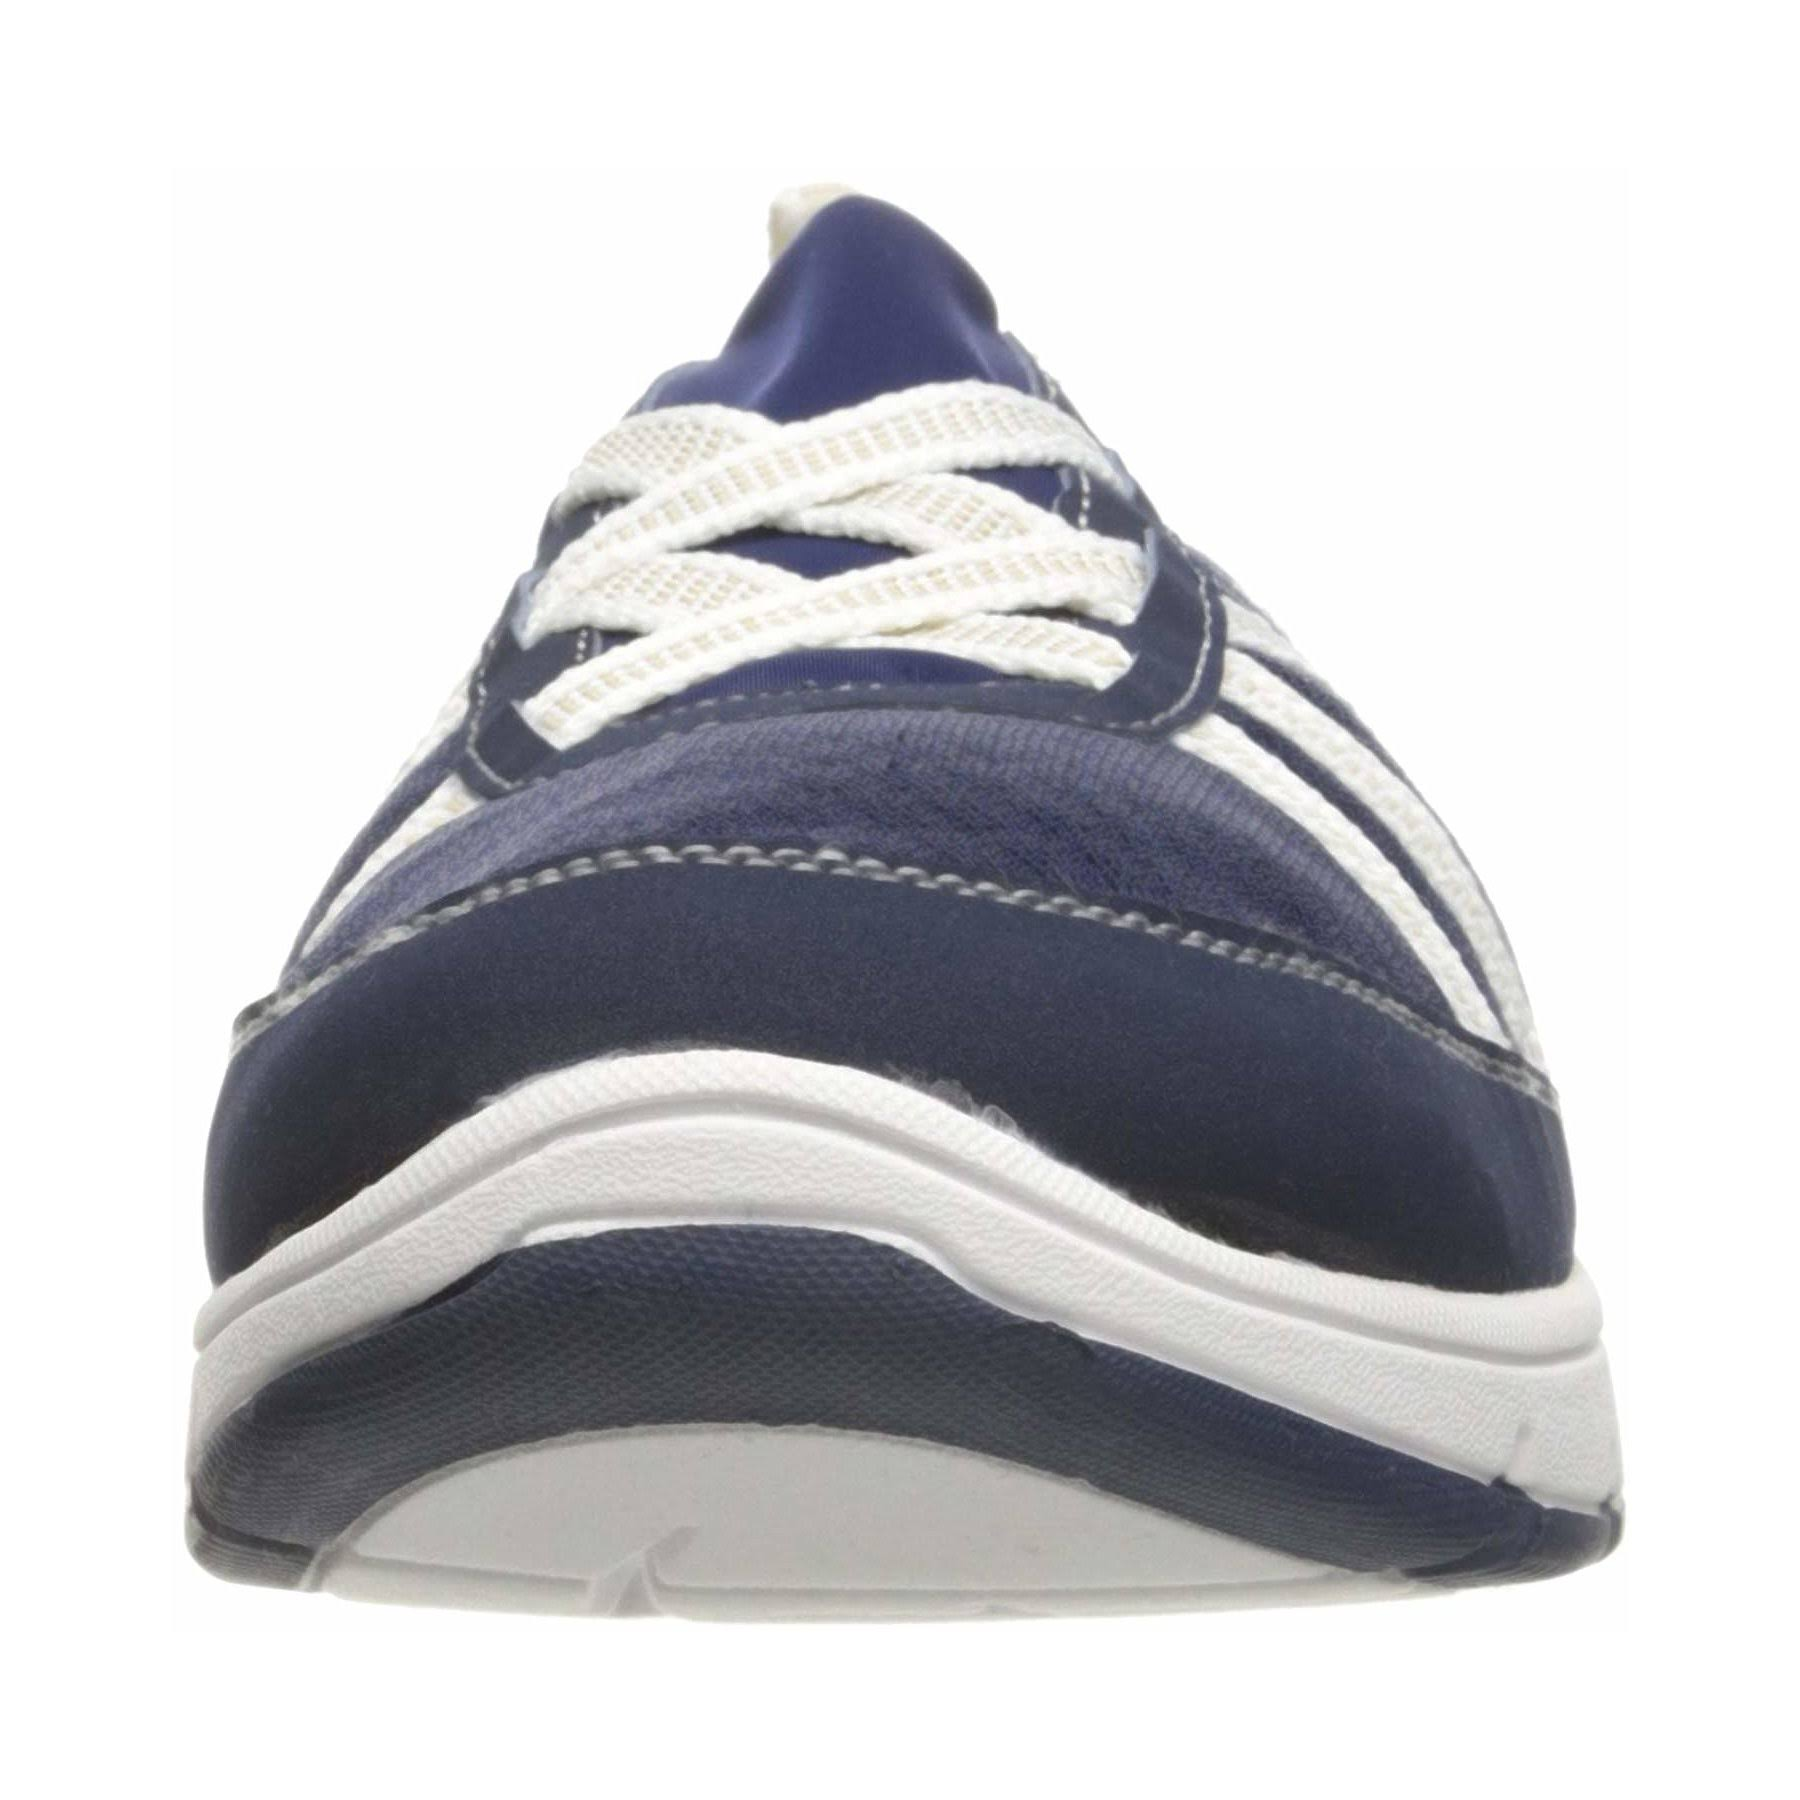 Azul 9 Athle Sports Marino Killa Sport Casuals Easy Zapatos W TqwfPxXn